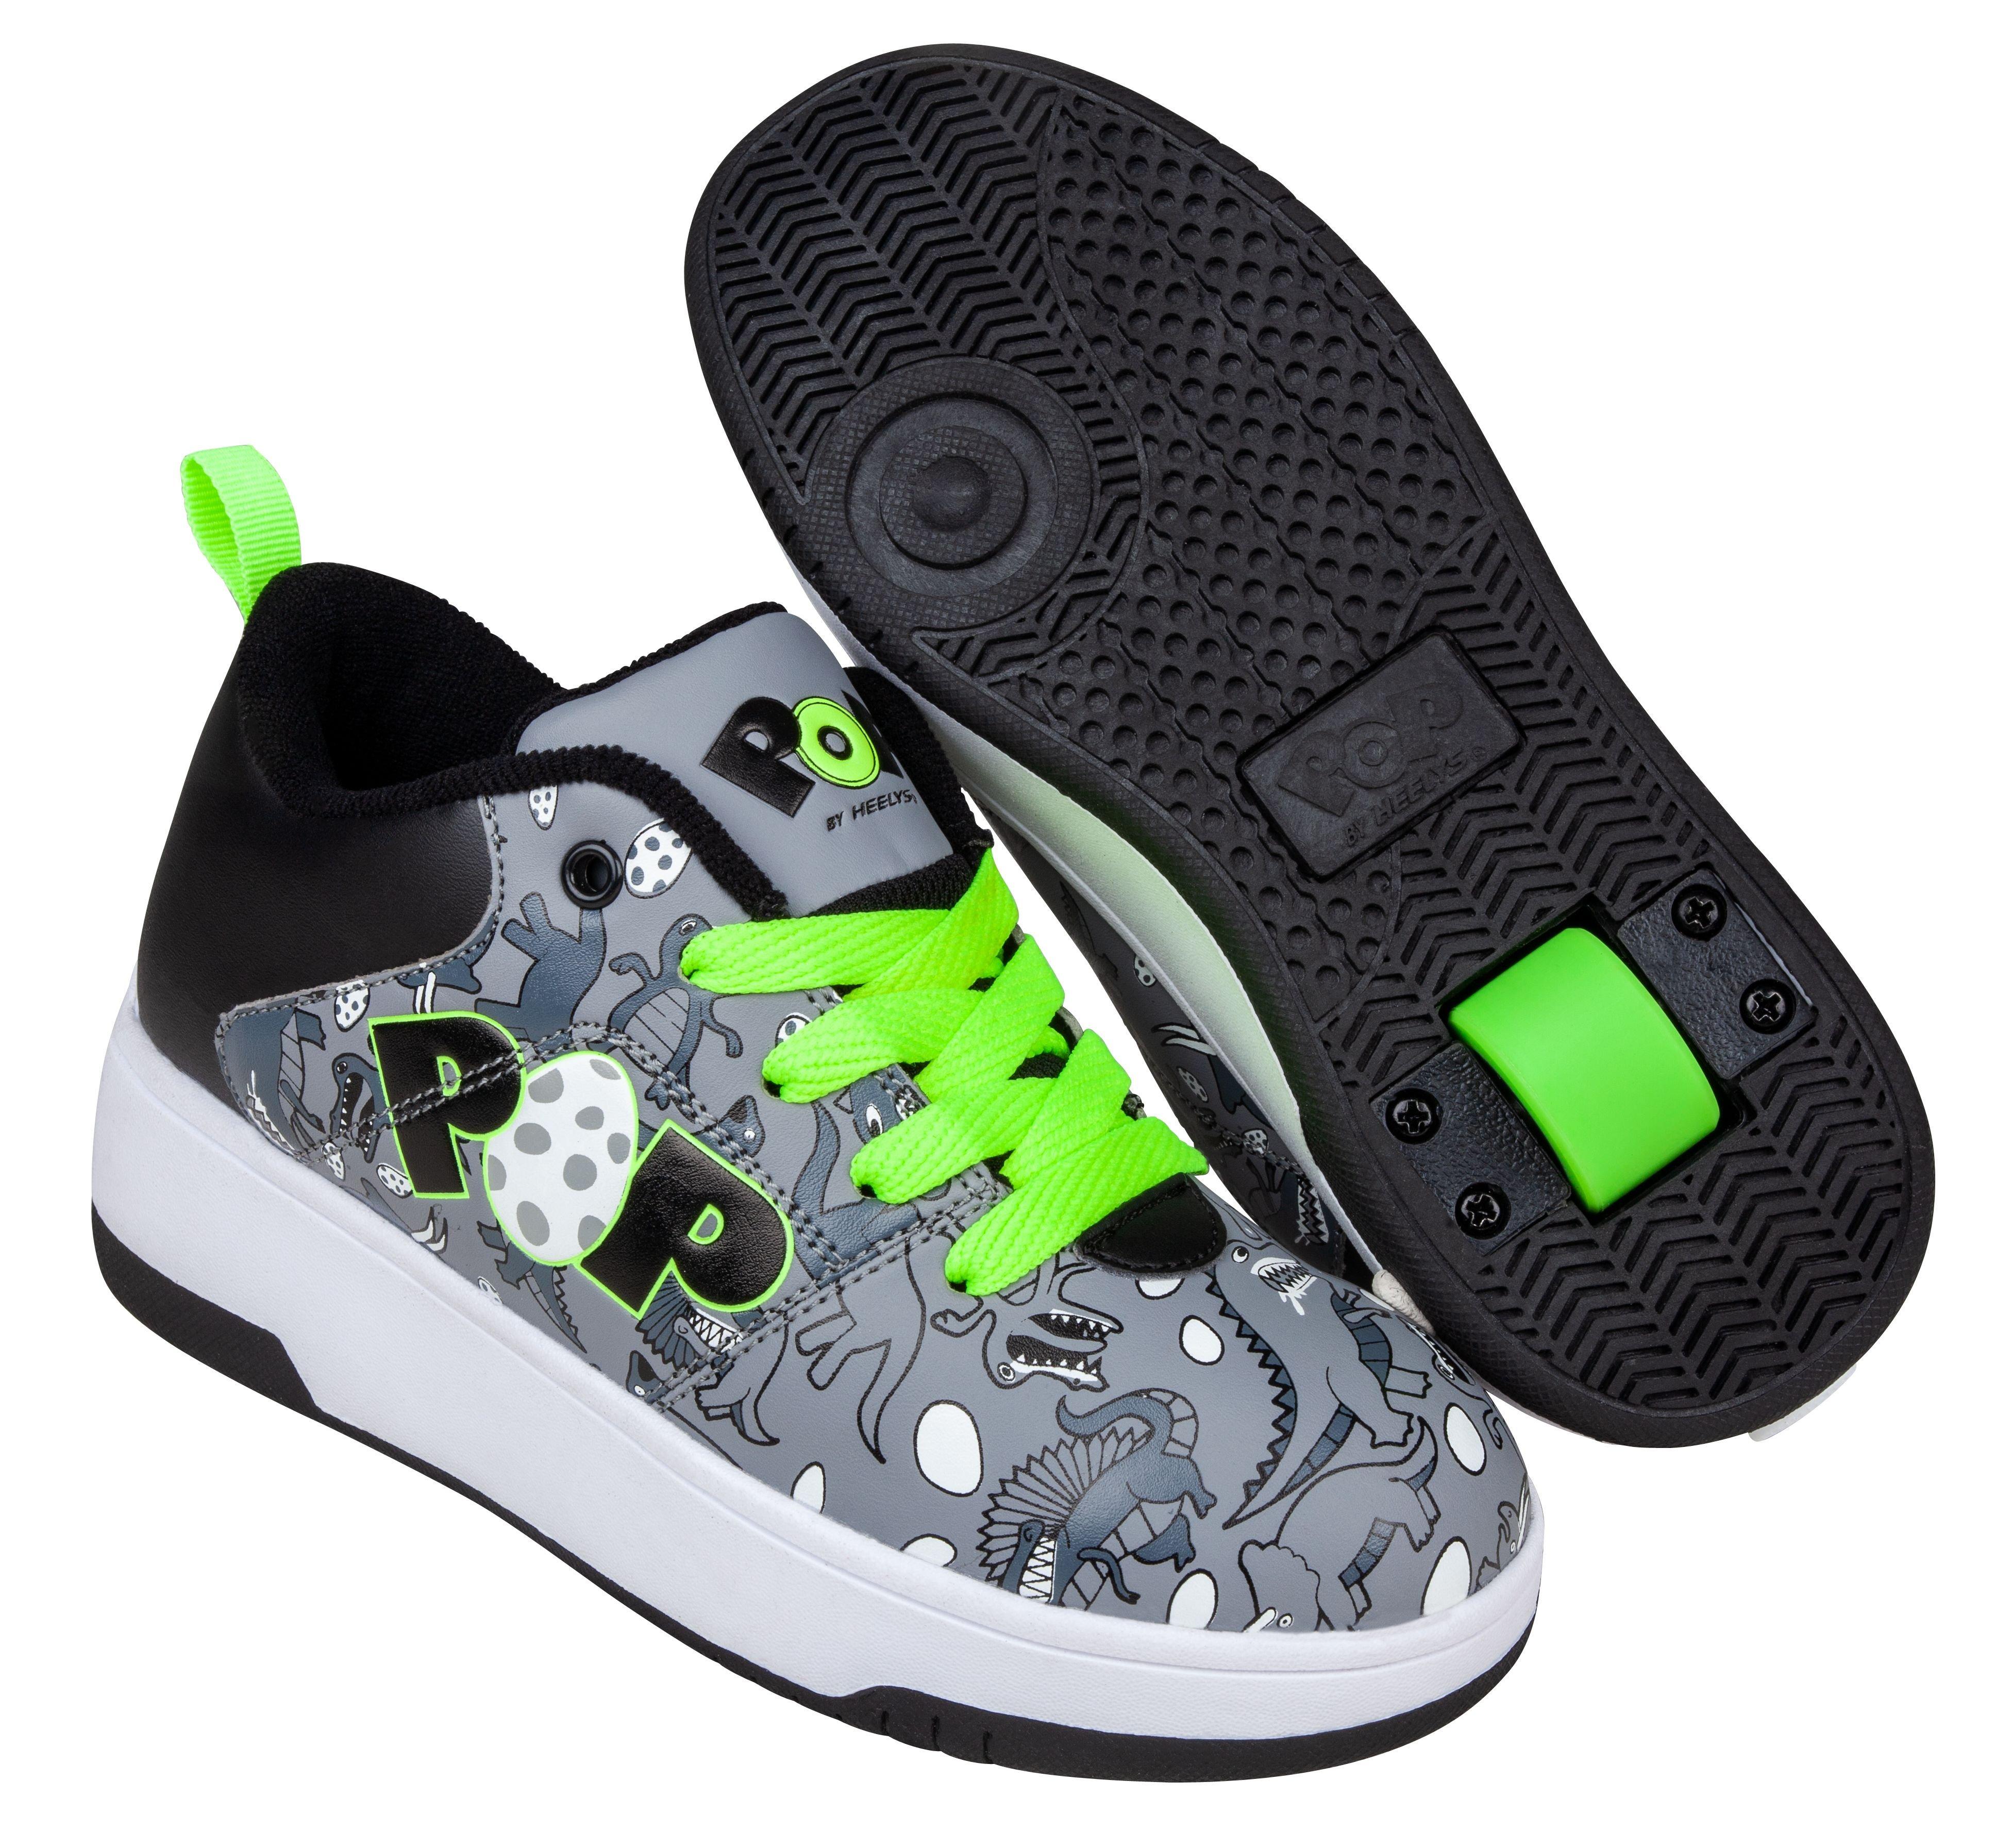 Heelys - POP Shoes - Charcoal (size 32) (POP-B1W-0081)